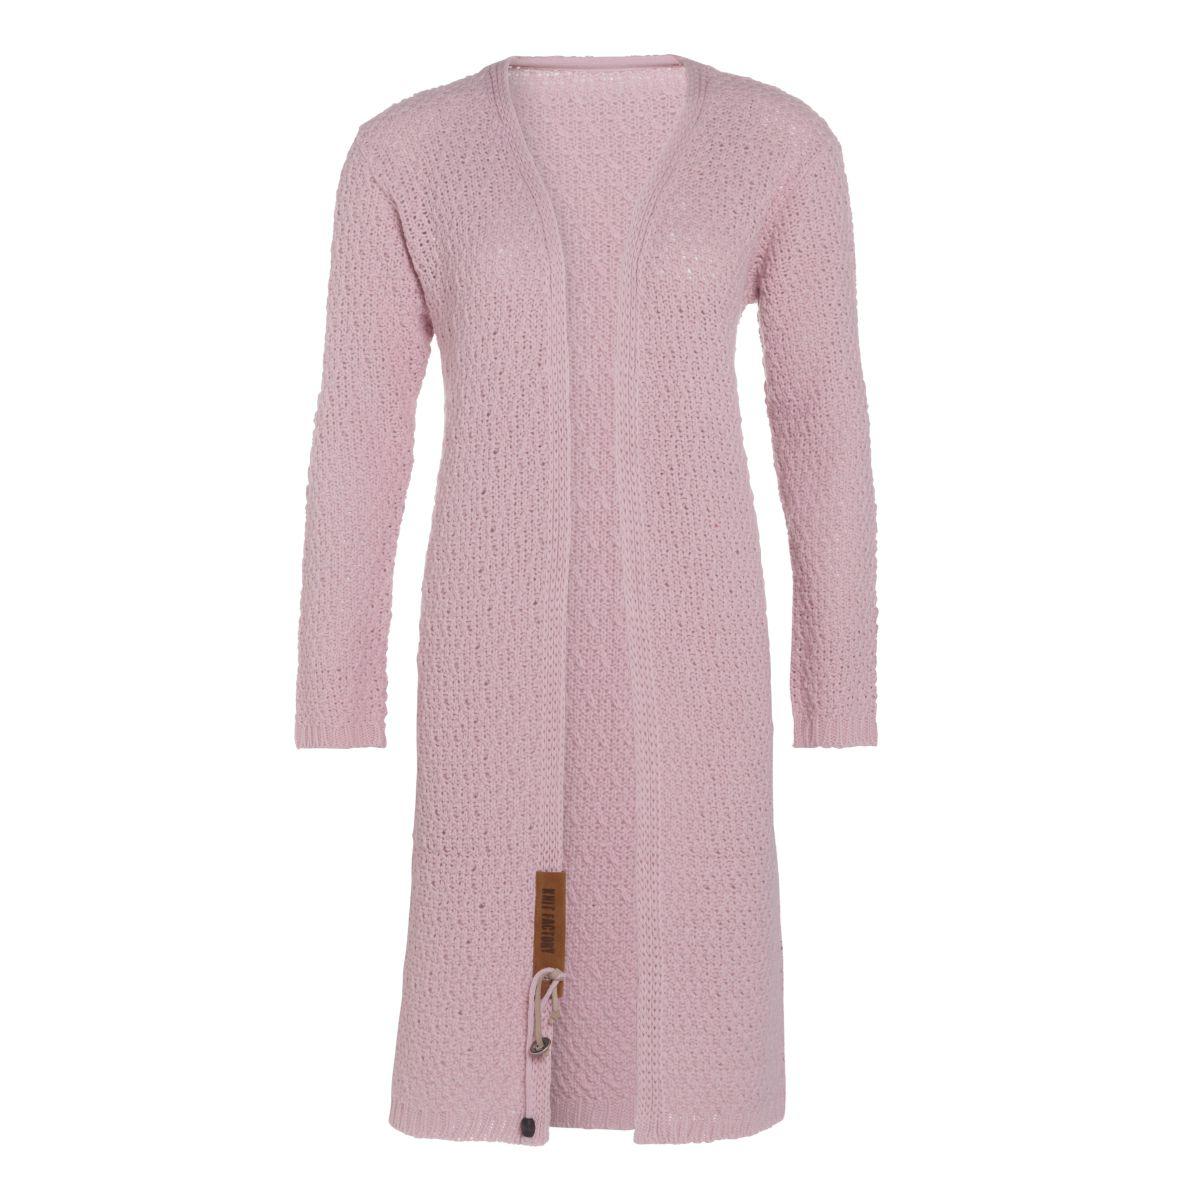 knit factory 1336321 luna vest 4042 roze 1